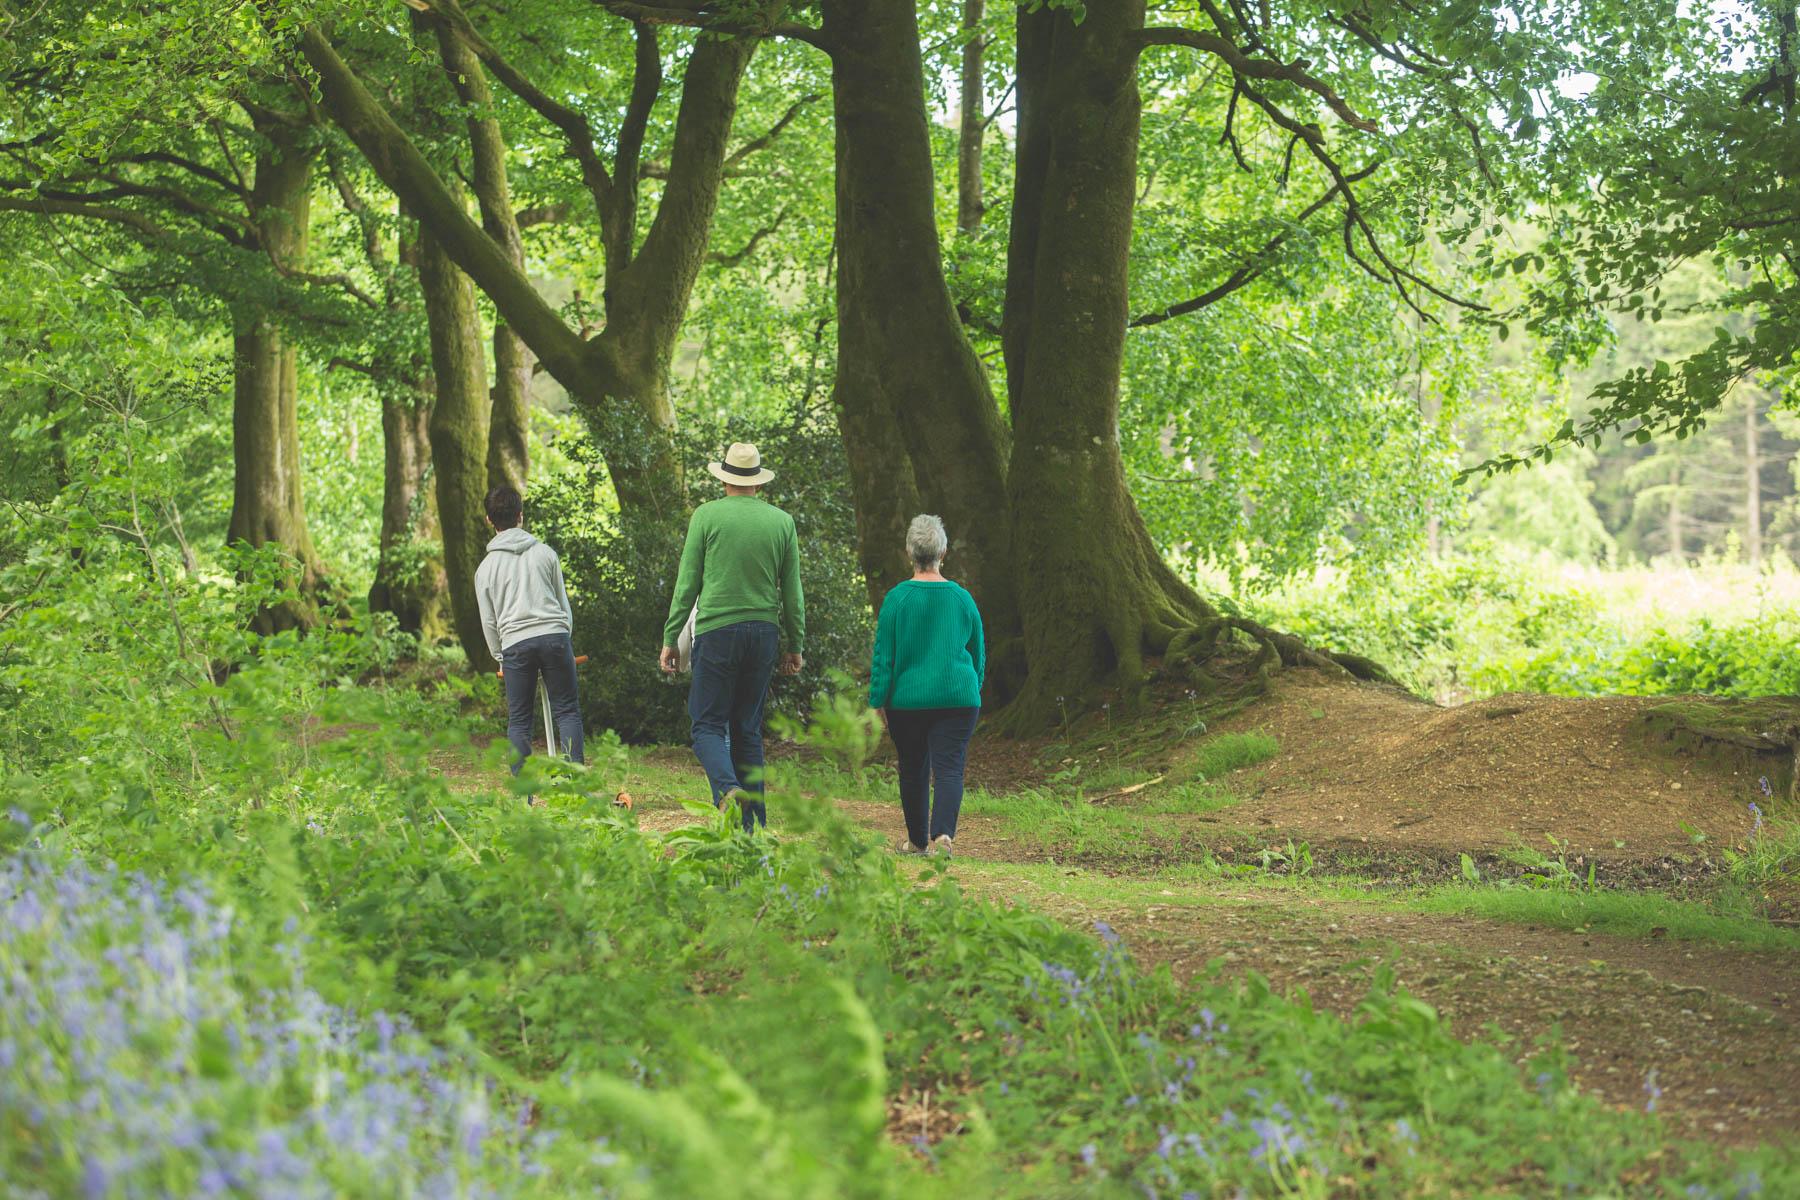 Forest Walks family